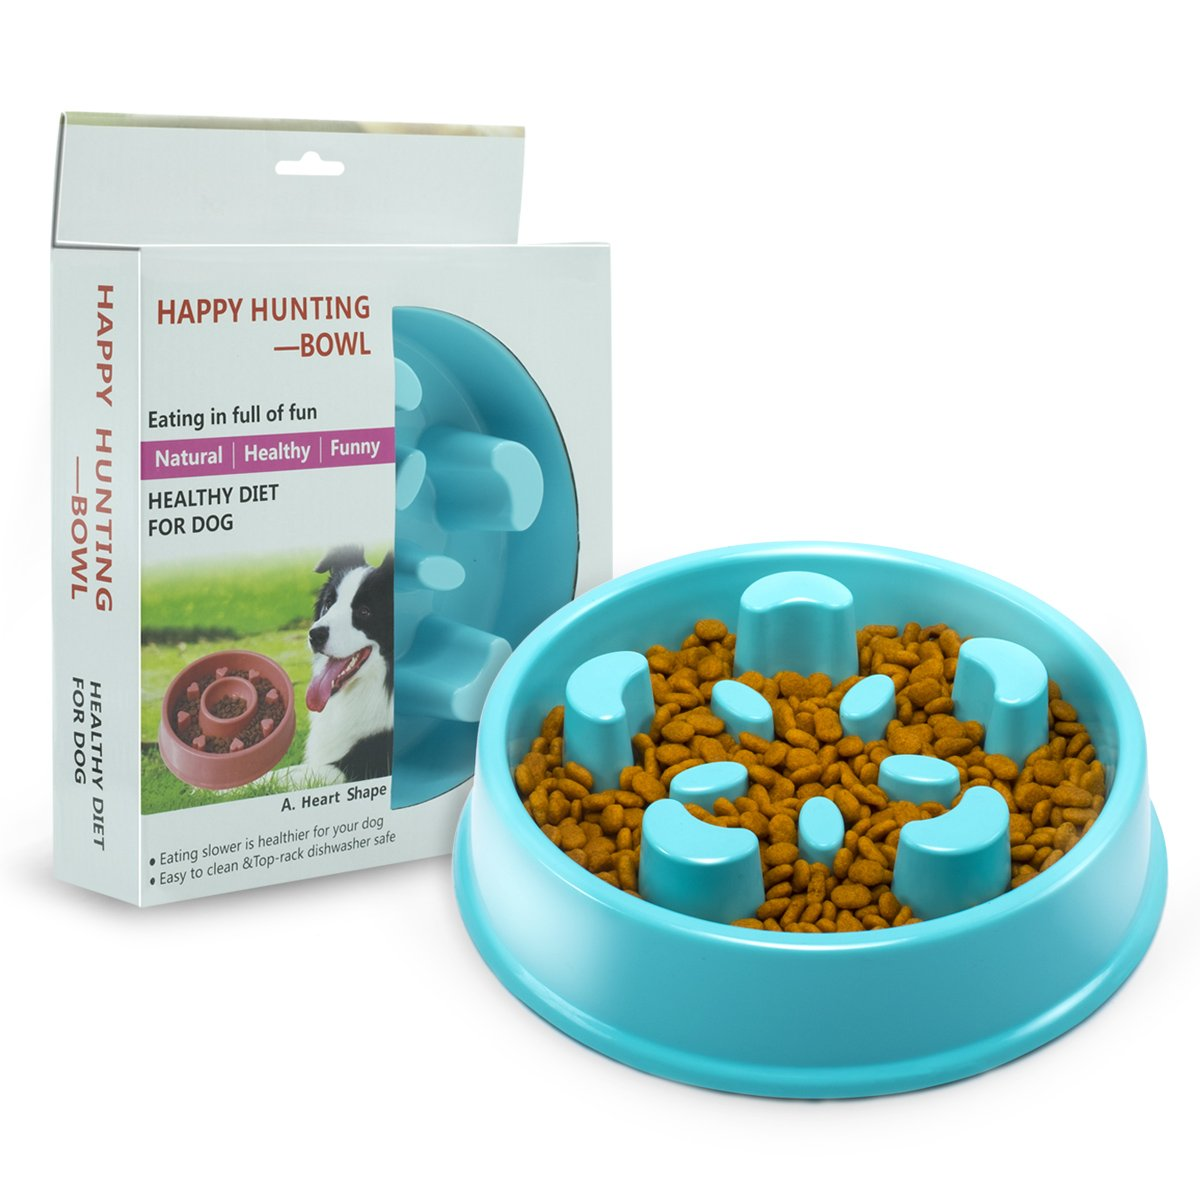 Slow Feeder Dog Bowl - Interactive Fun Slow Eating Bowl for Pets Health Bloat Stop Anti-Choking, Non-Toxic. Eco-Friendly Material